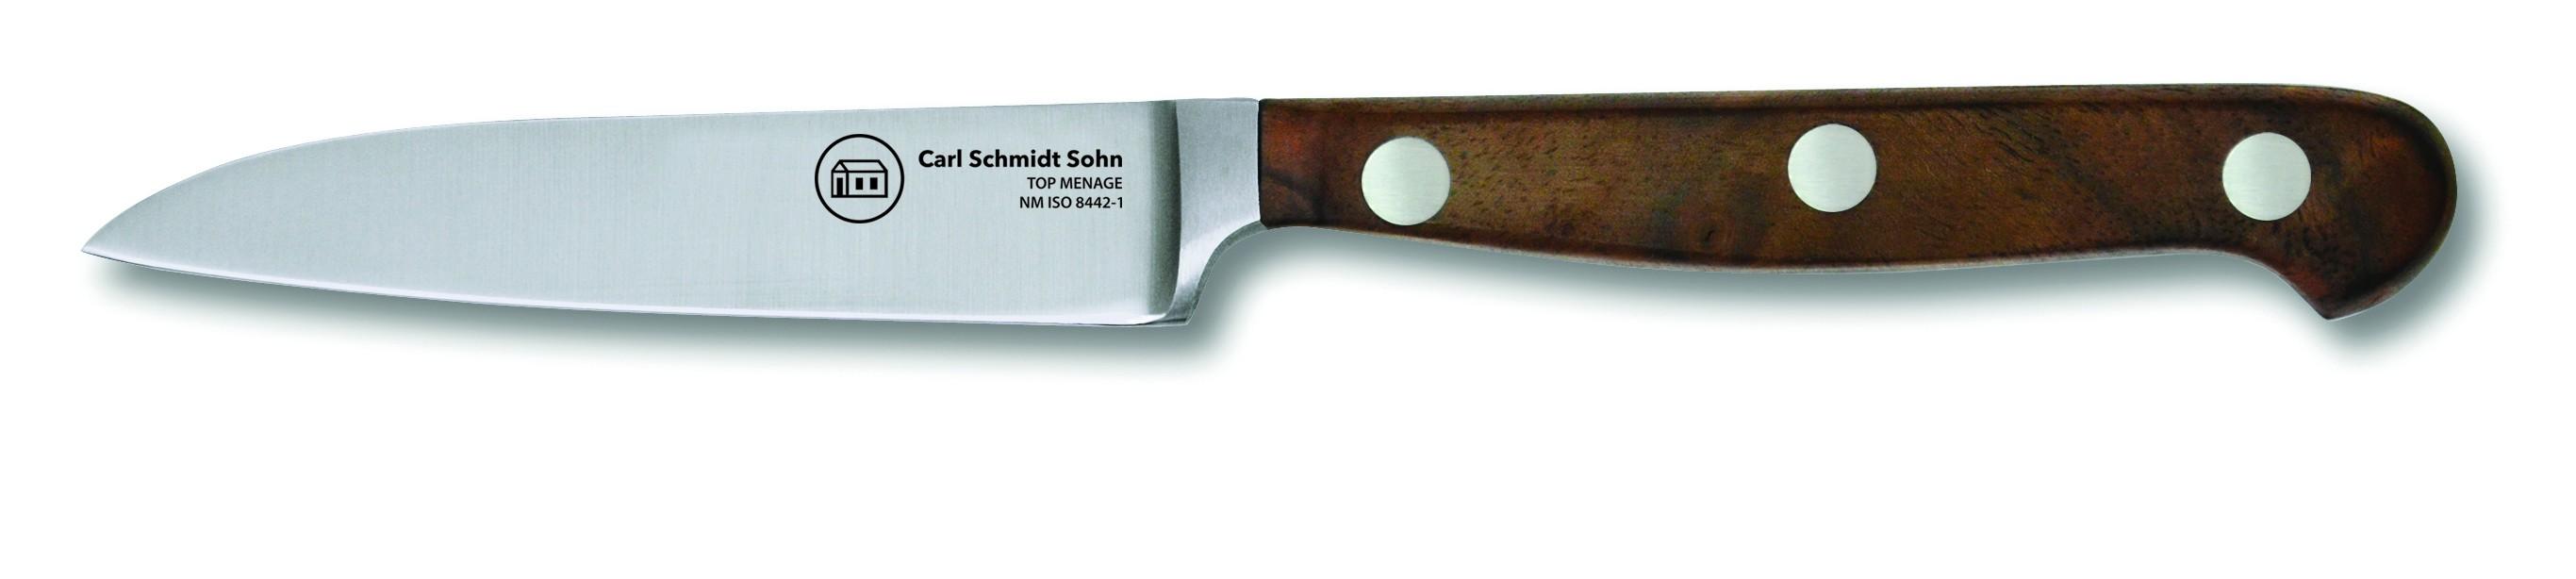 TESSIN Spickmesser 9 cm